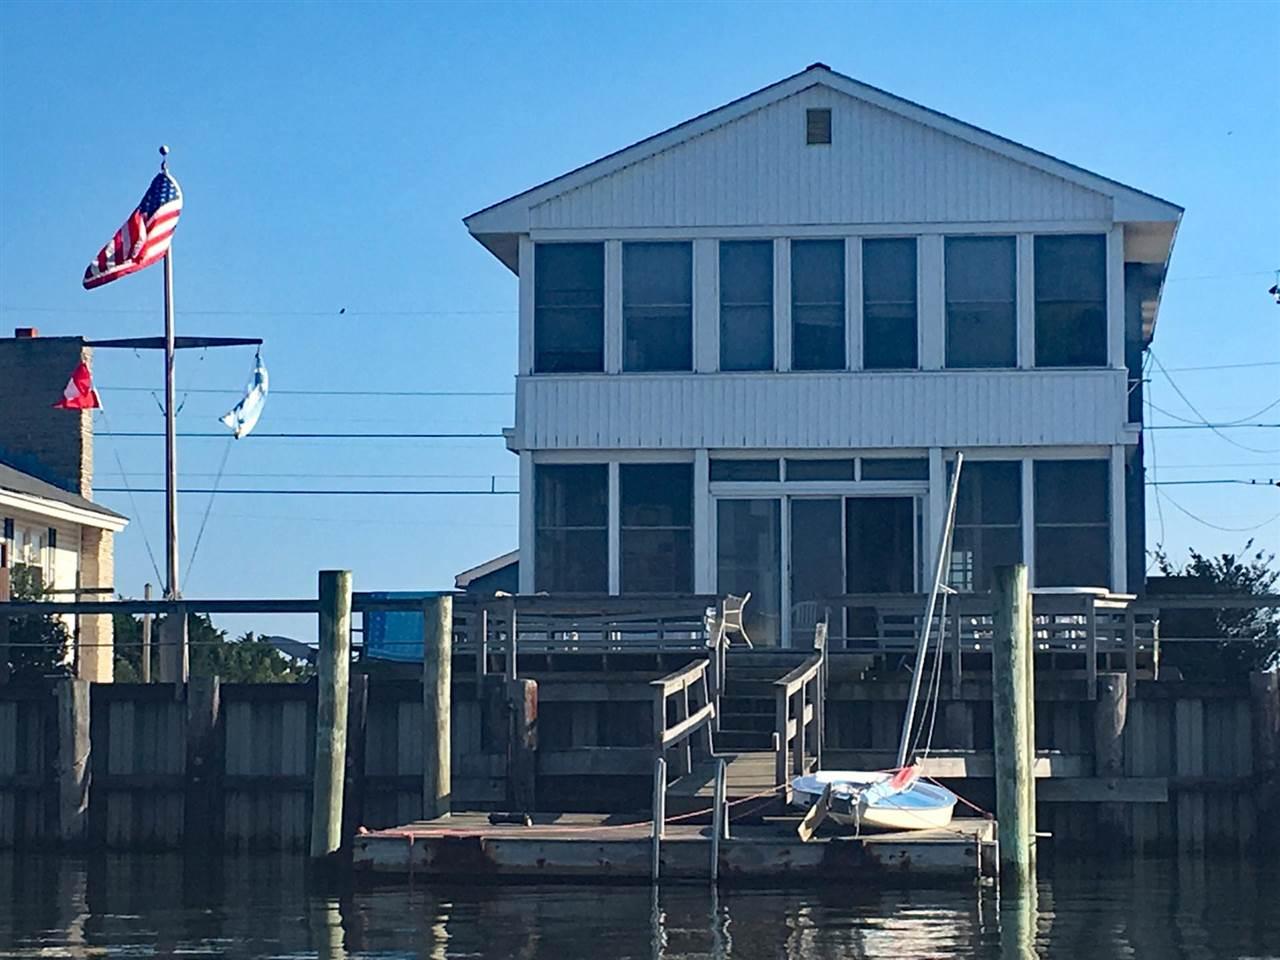 11817 Paradise ,Stone Harbor, New Jersey, 08247